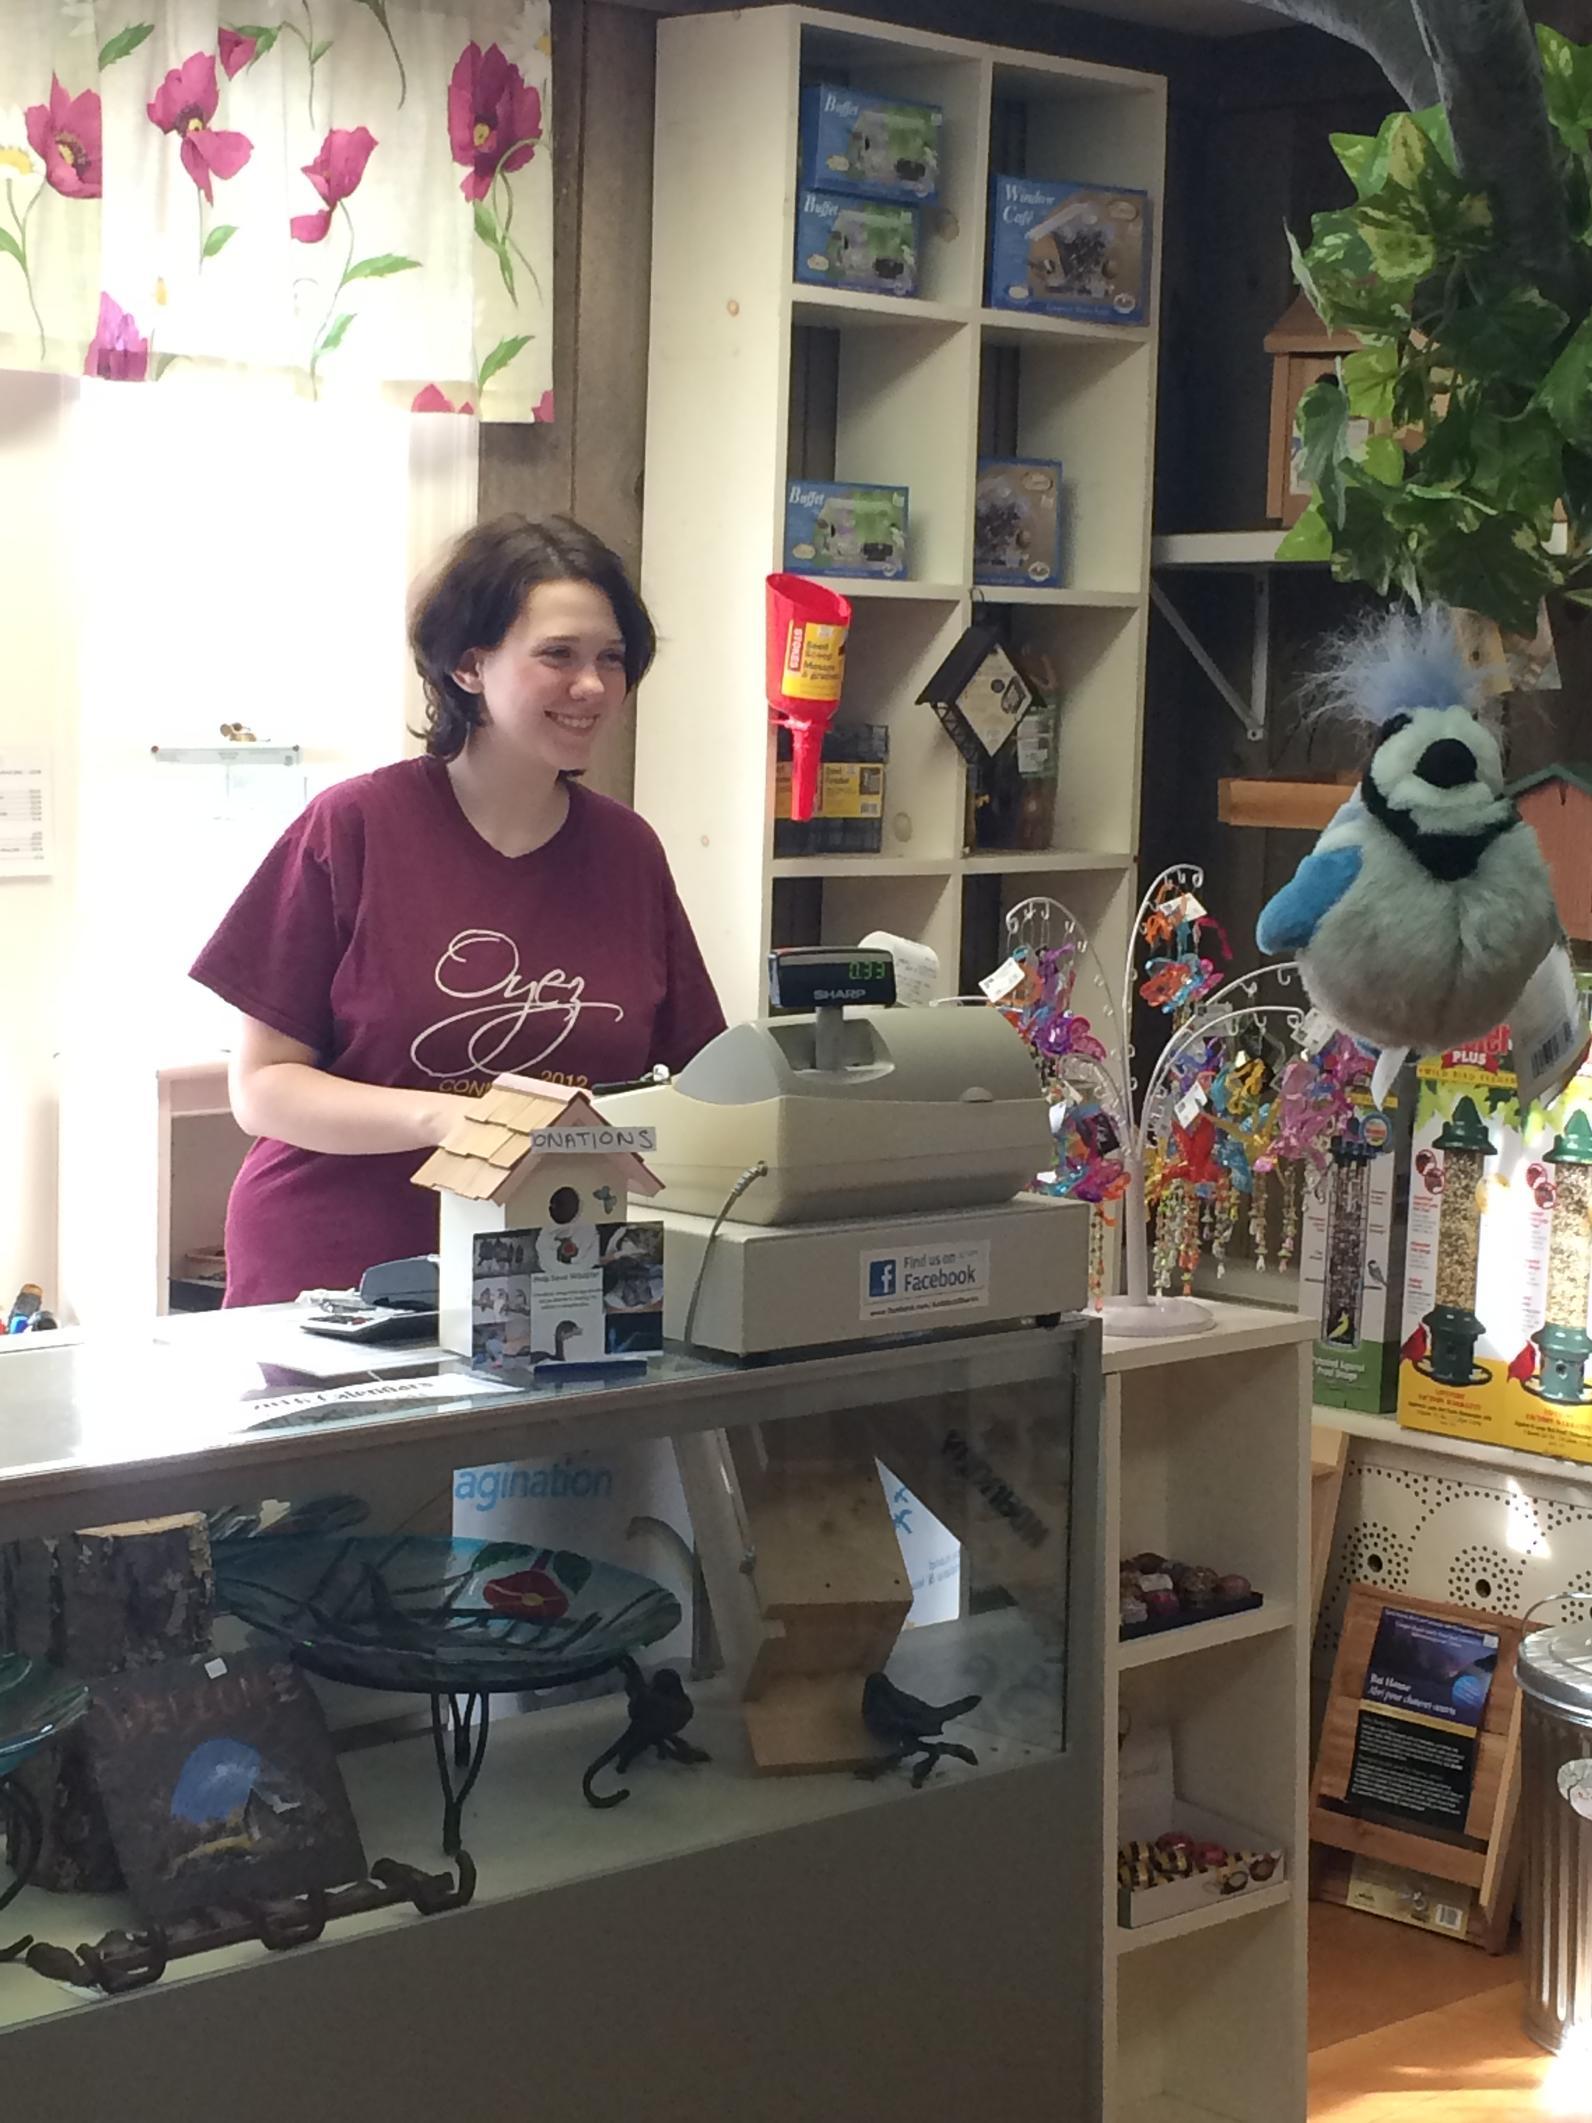 nature store office clerk audubon sharon nature store office clerk